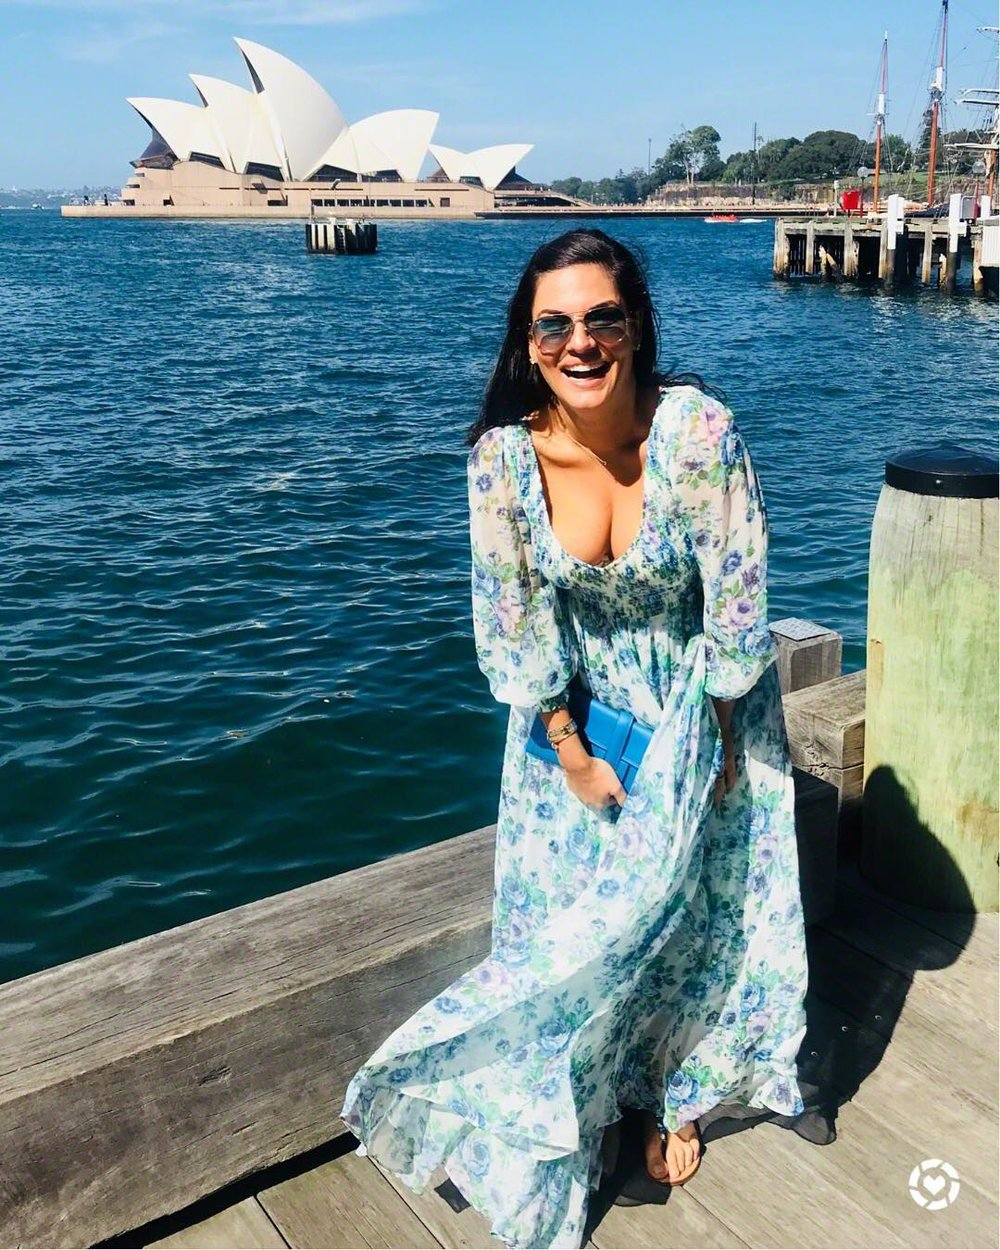 Nicole O'Neil Easter Outfit - Wearing Blue Zimmermann Whitewash Dress.jpg